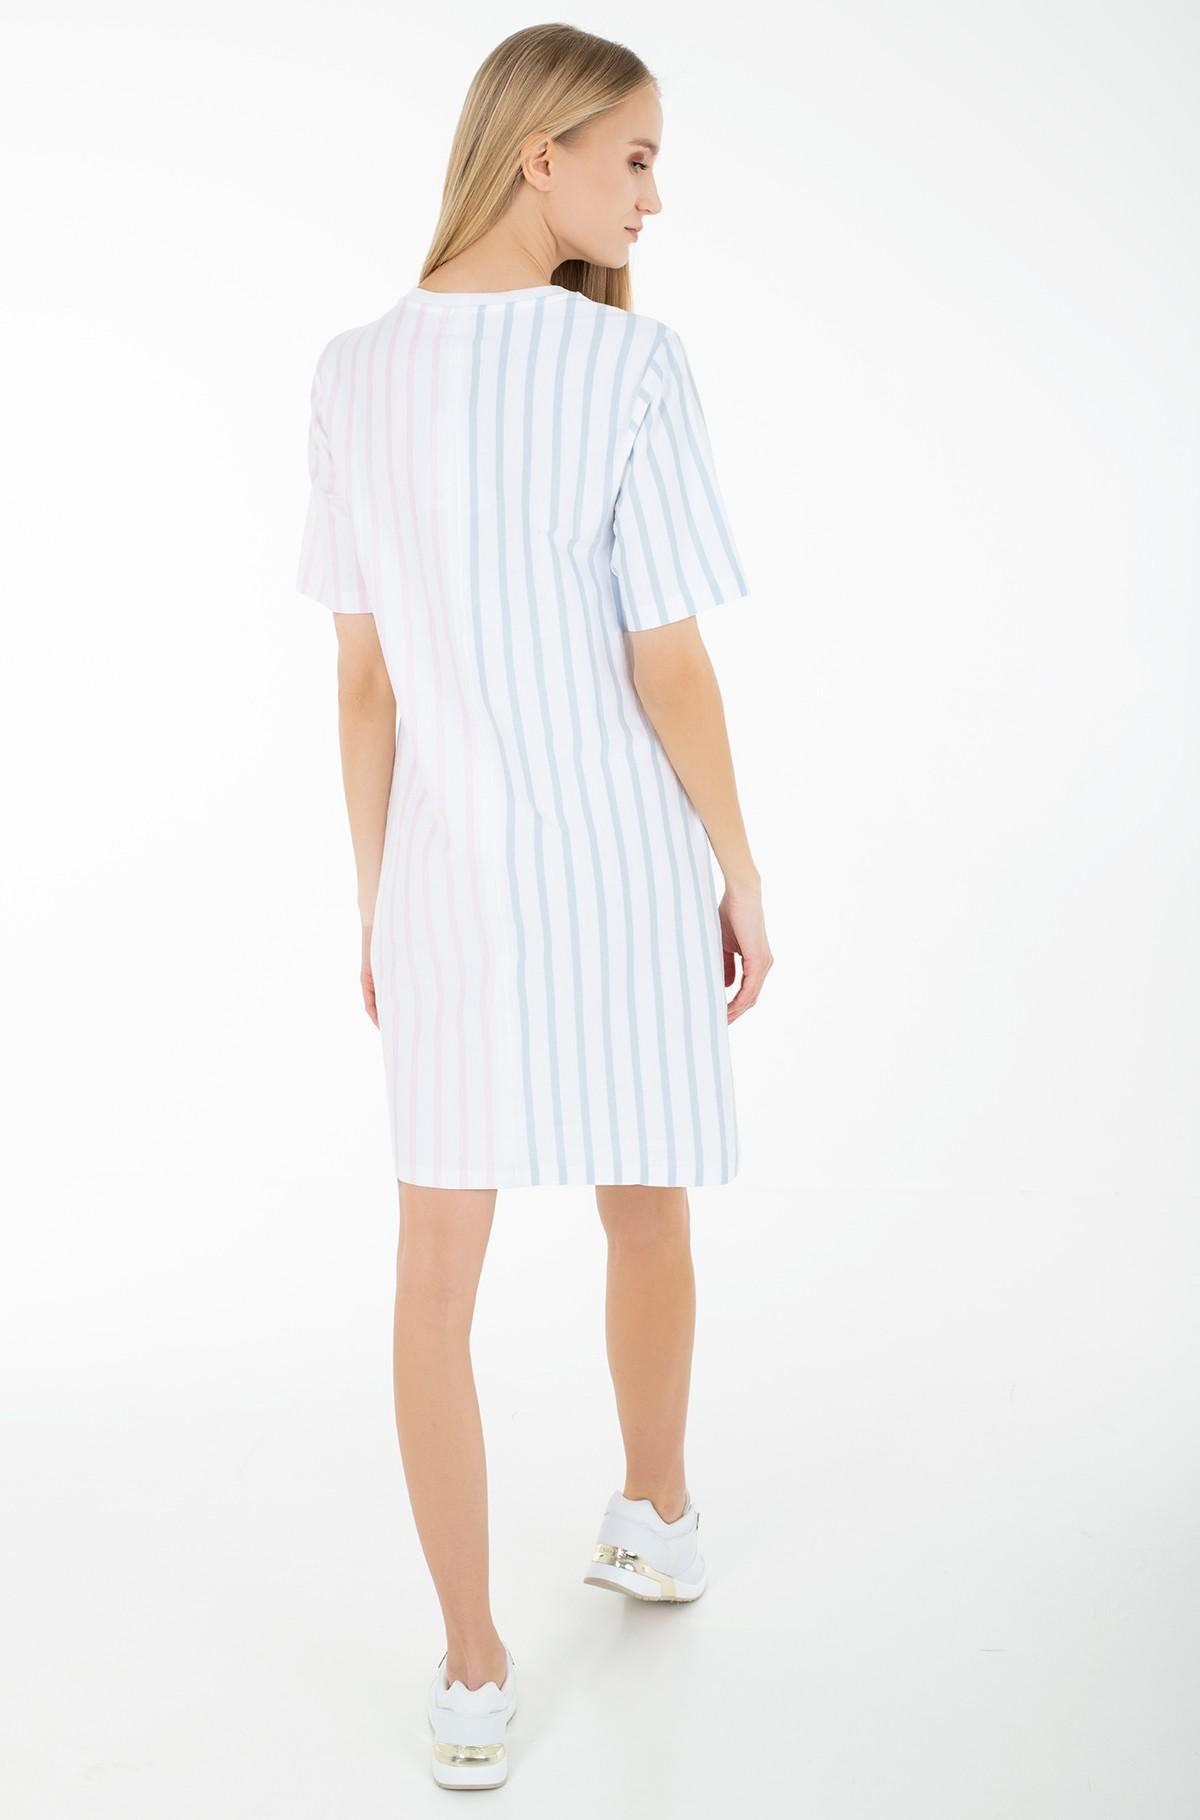 Dress ICON CLR BLOCK SHIFT SHORT DRESS-full-2